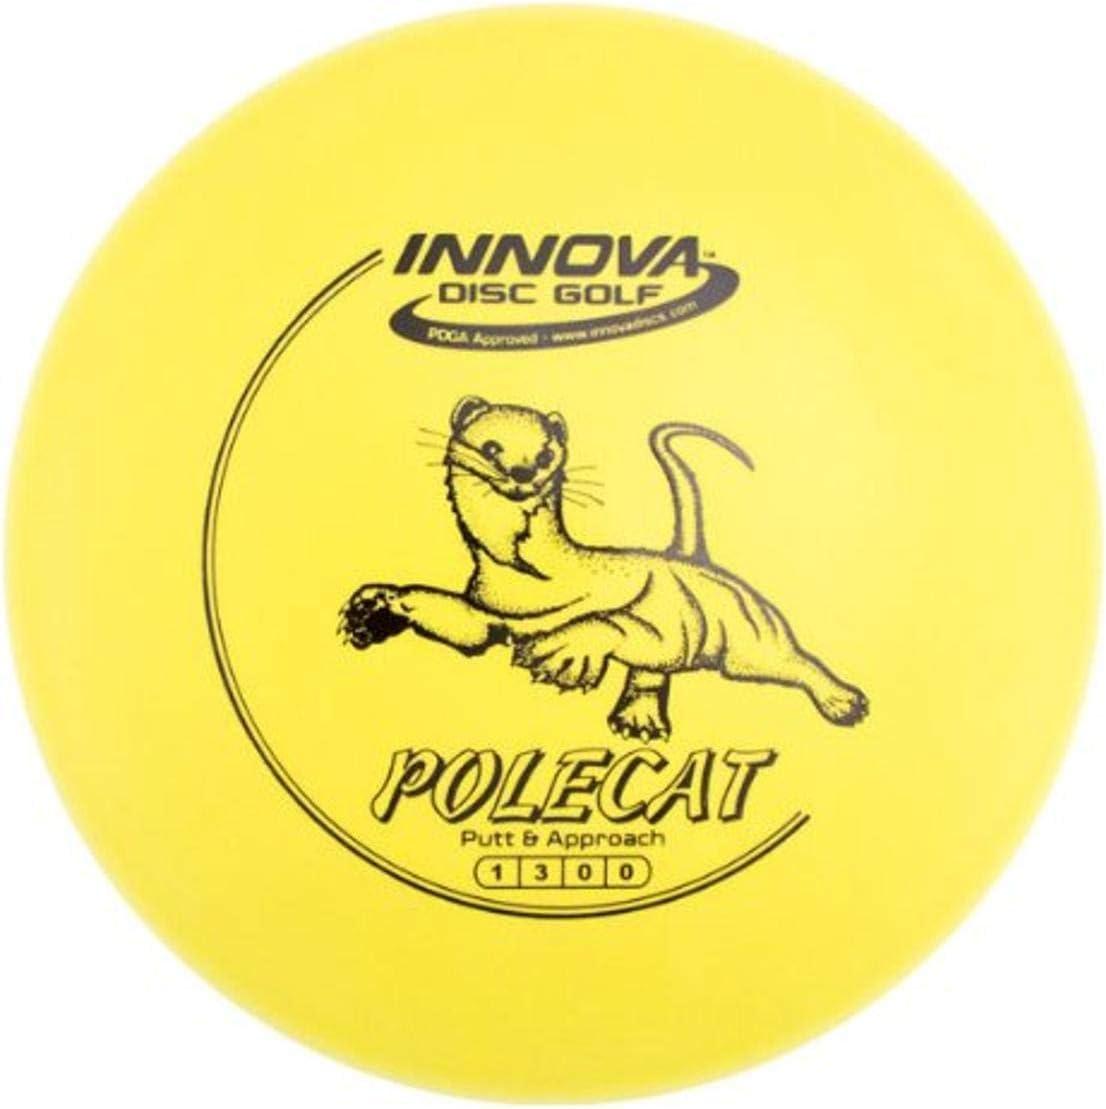 Innova - Champion Discs DX Polecat Golf Disc (Colors may vary)